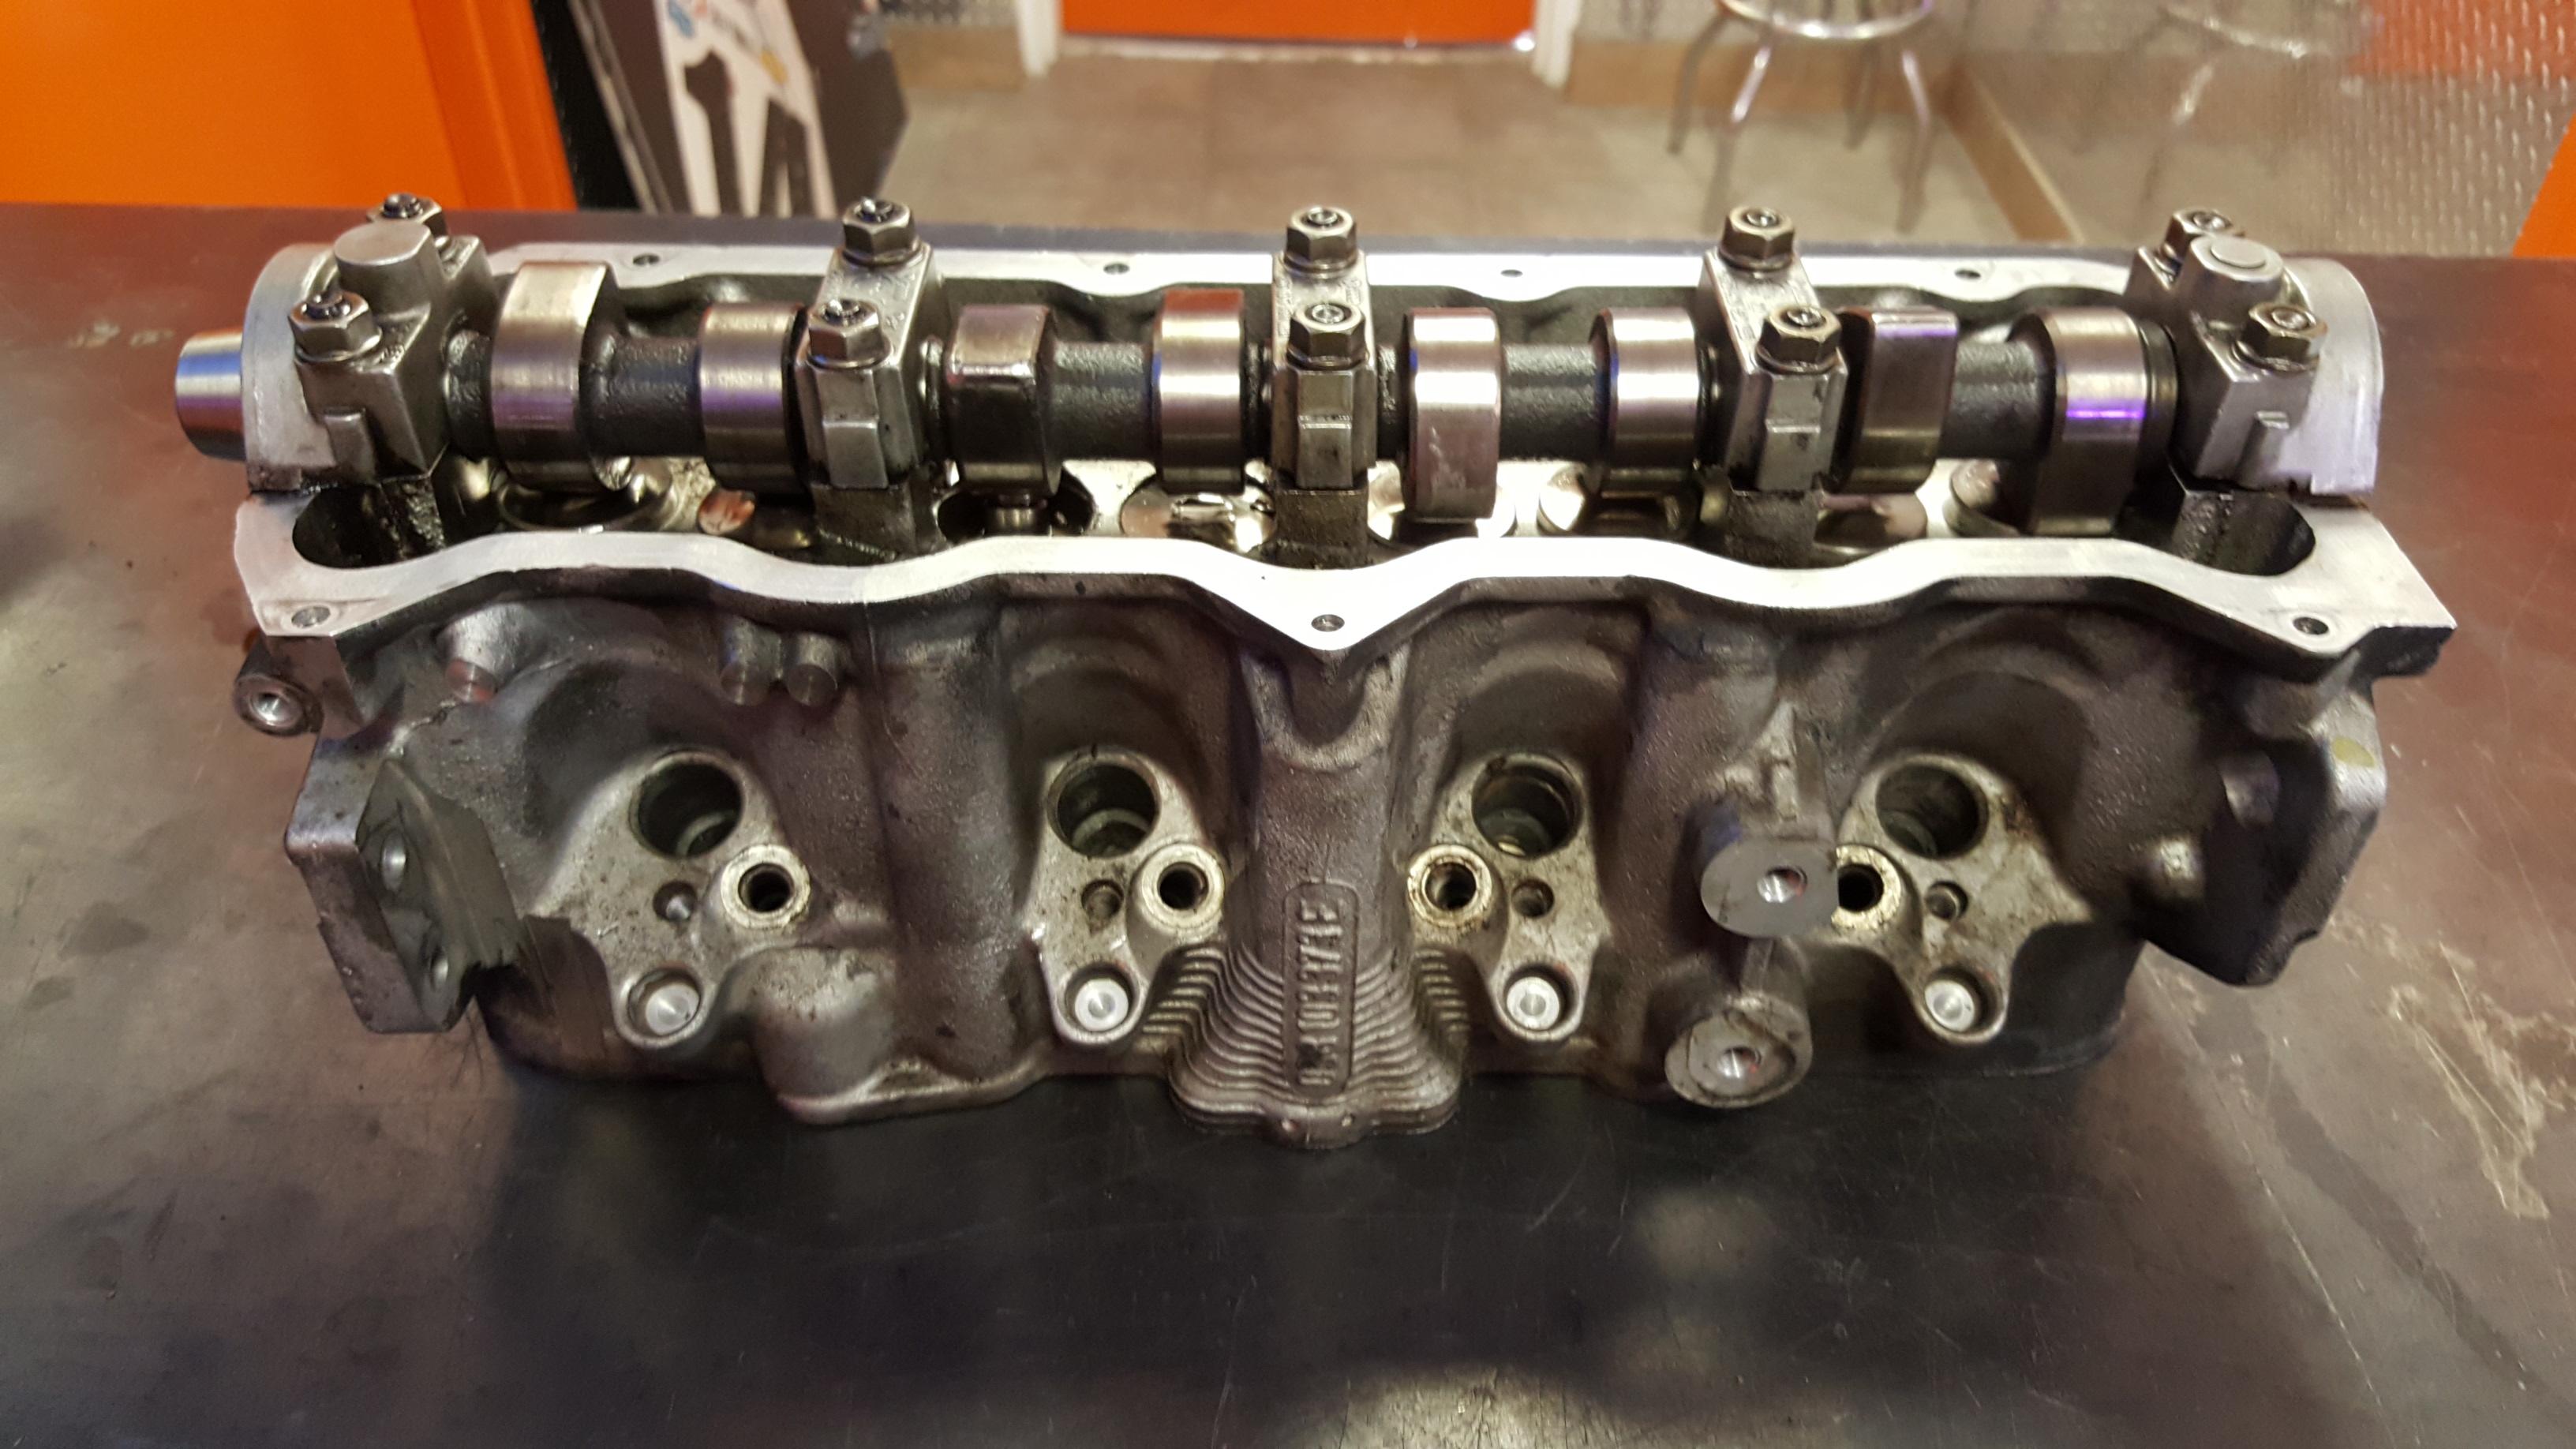 Volkswagen Aluminum Cylinder Head Valve Job and Surface